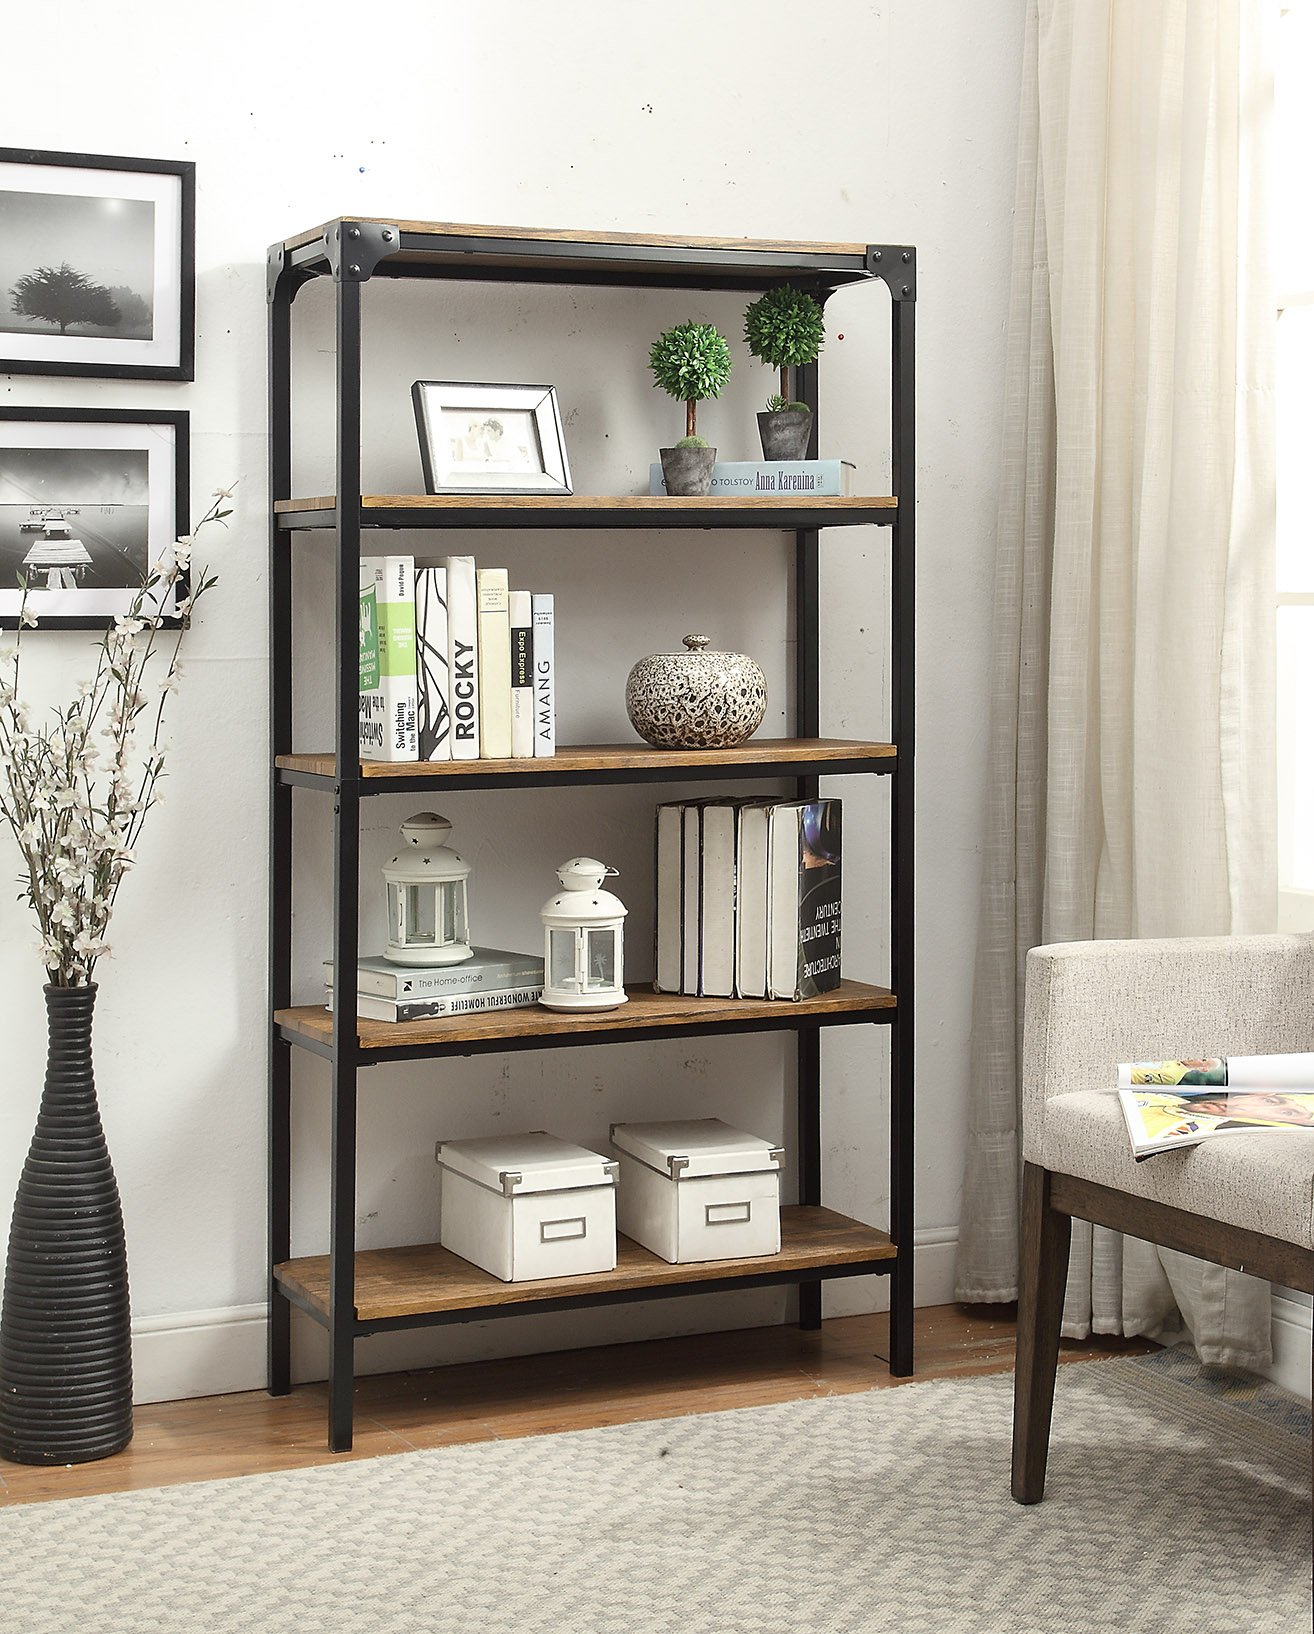 5-tier Vintage Brown Industrial Look Black Metal Bookcase Bookshelf Shelf Heavy Duty